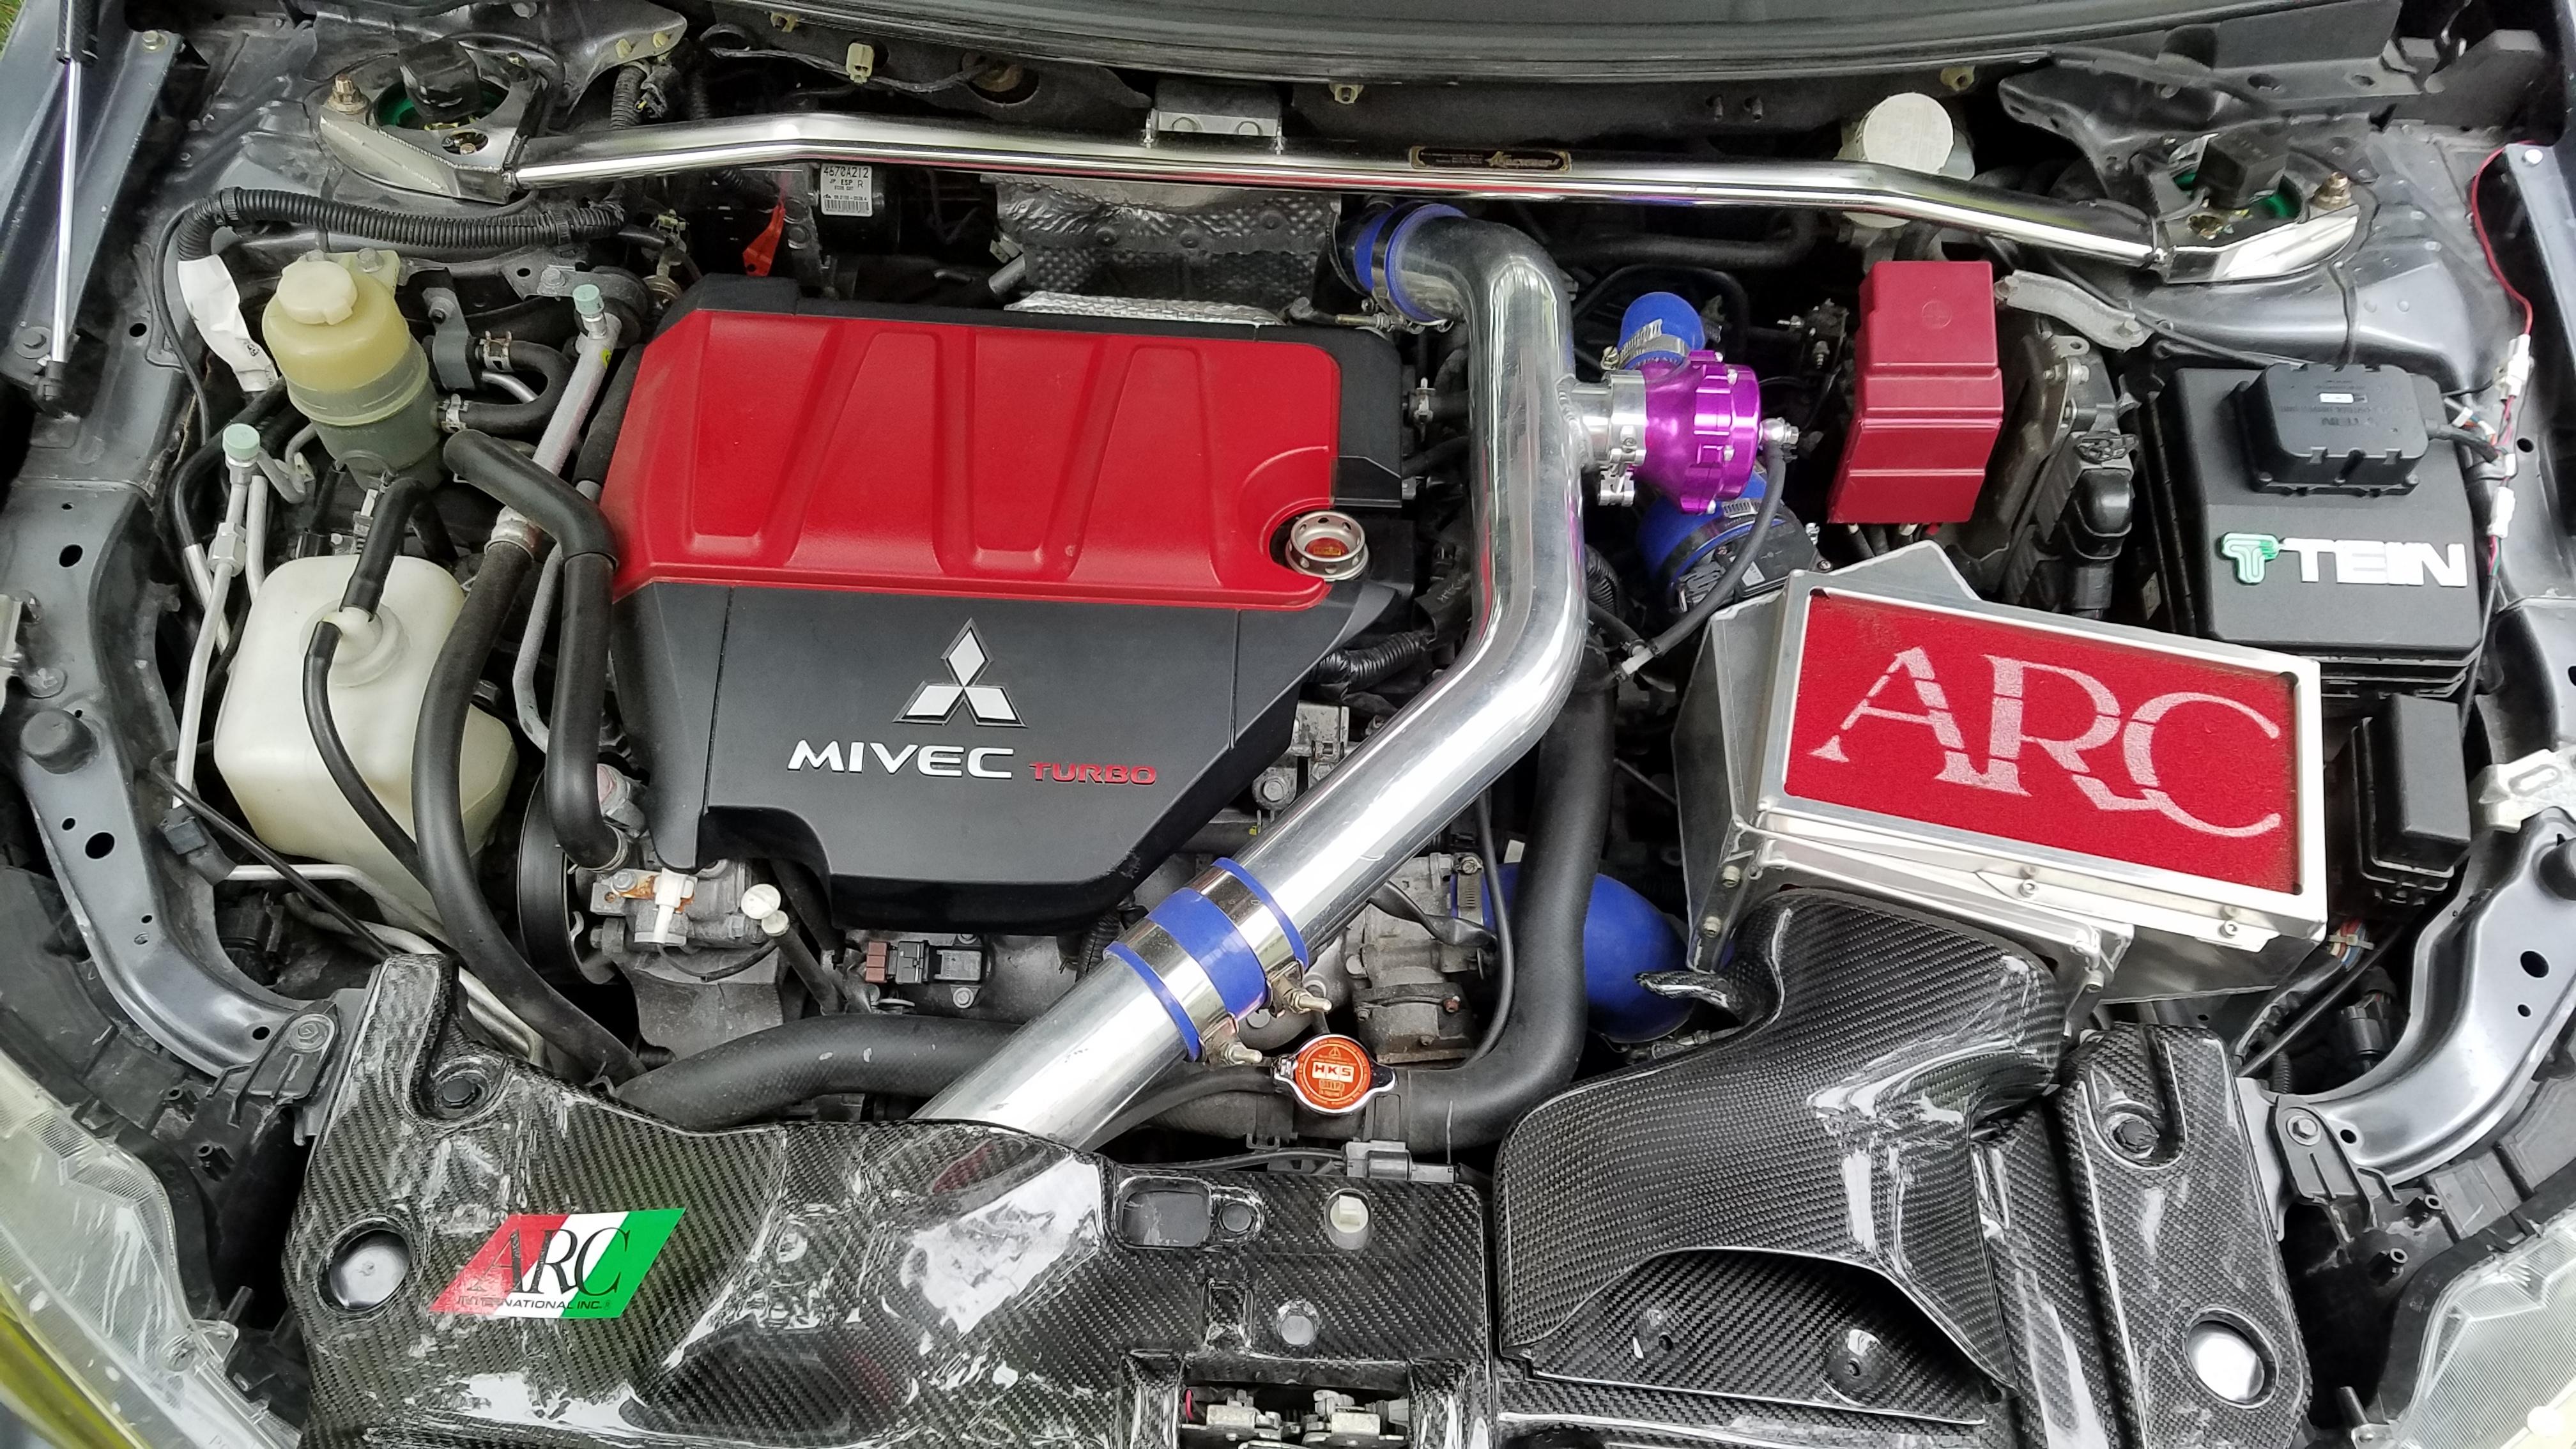 ZH_1789] Mitsubishi Lancer 2002 Engine Compartment Diagram Free Diagram